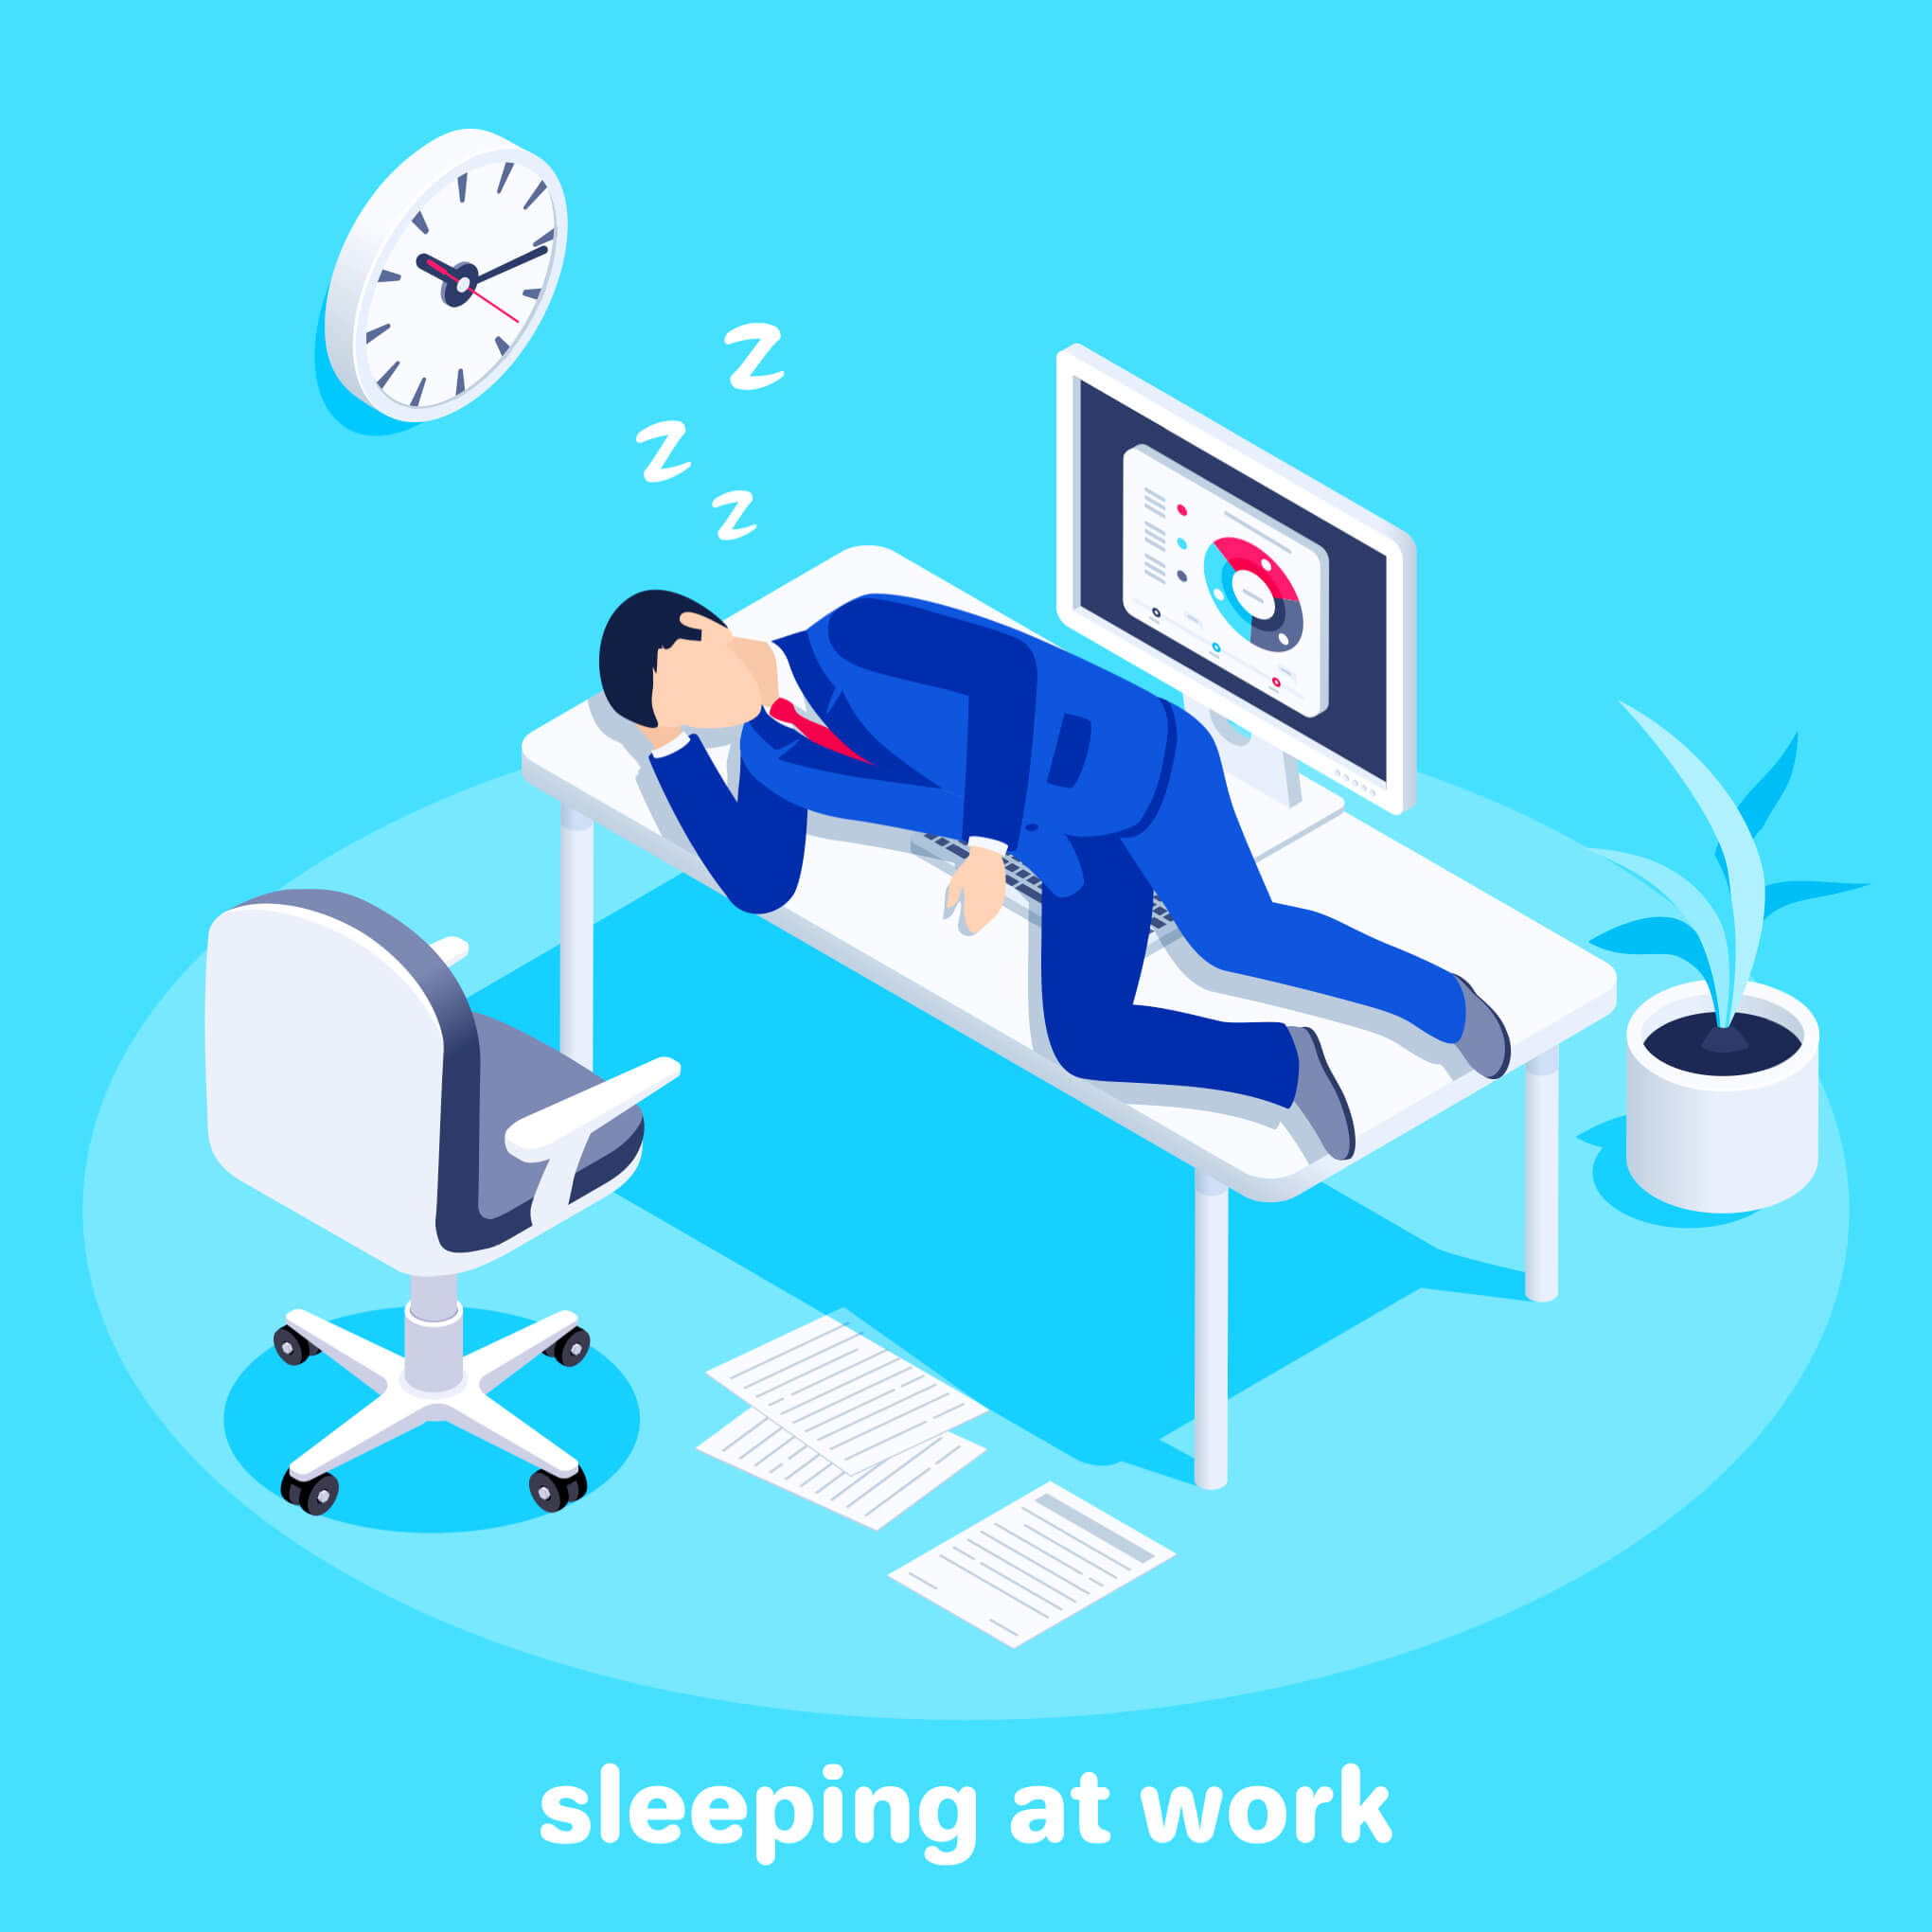 sleep, sleep deprivation, sleeping on job, sleeping project manager